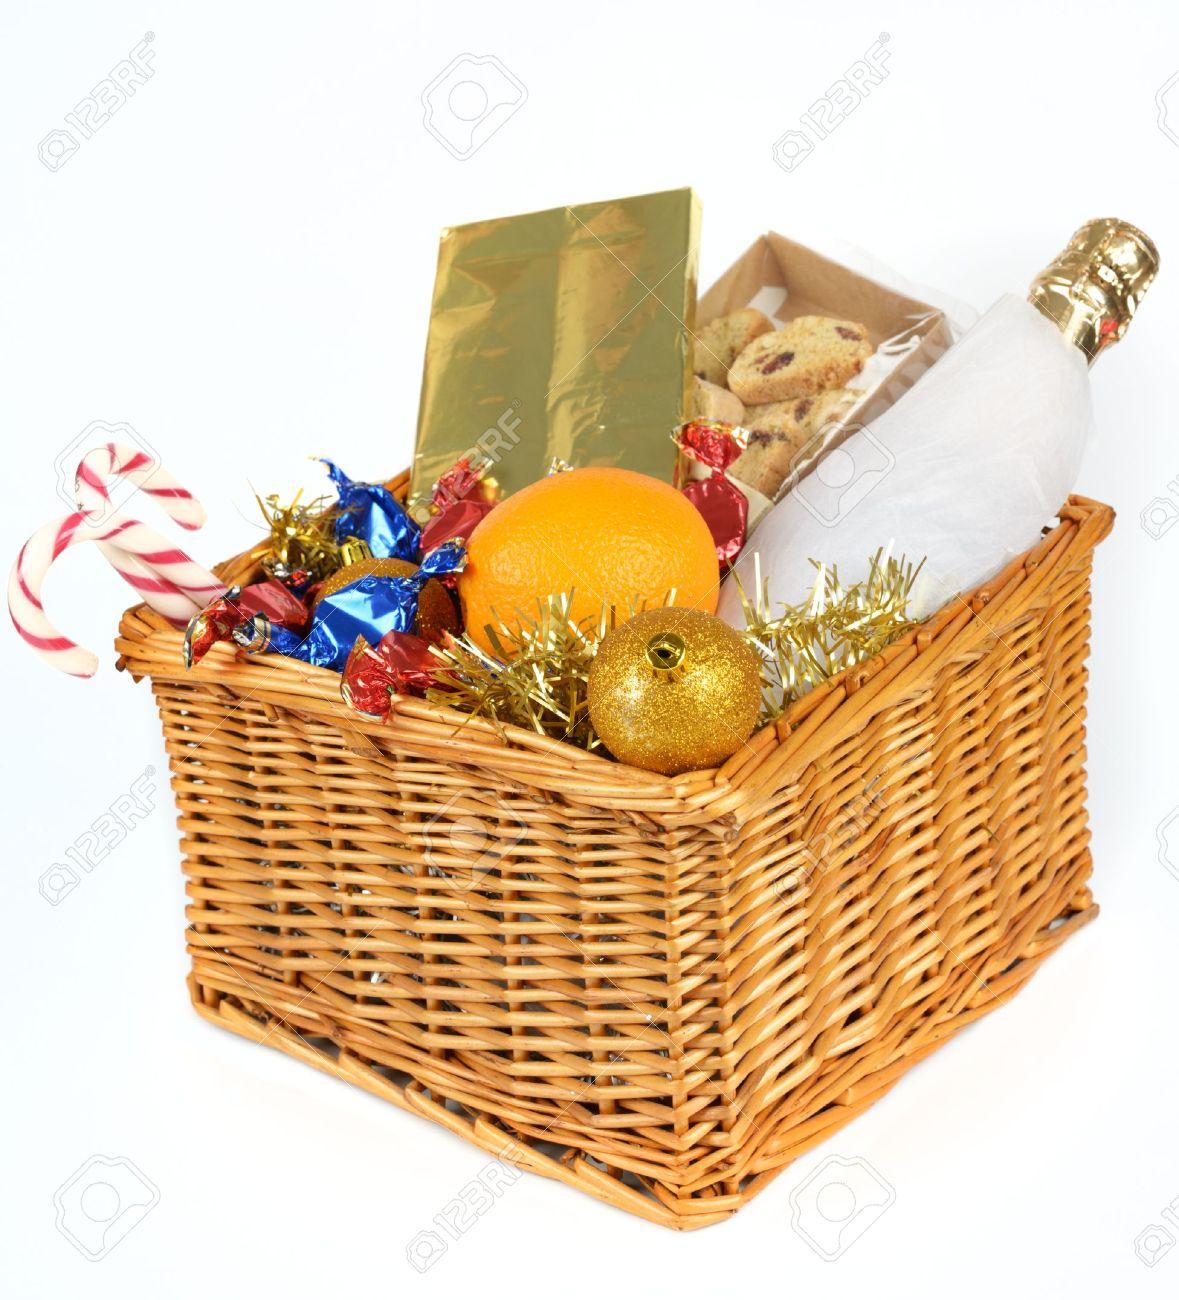 Christmas gift basket isolated on white background stock photo christmas gift basket isolated on white background stock photo 17629111 negle Images